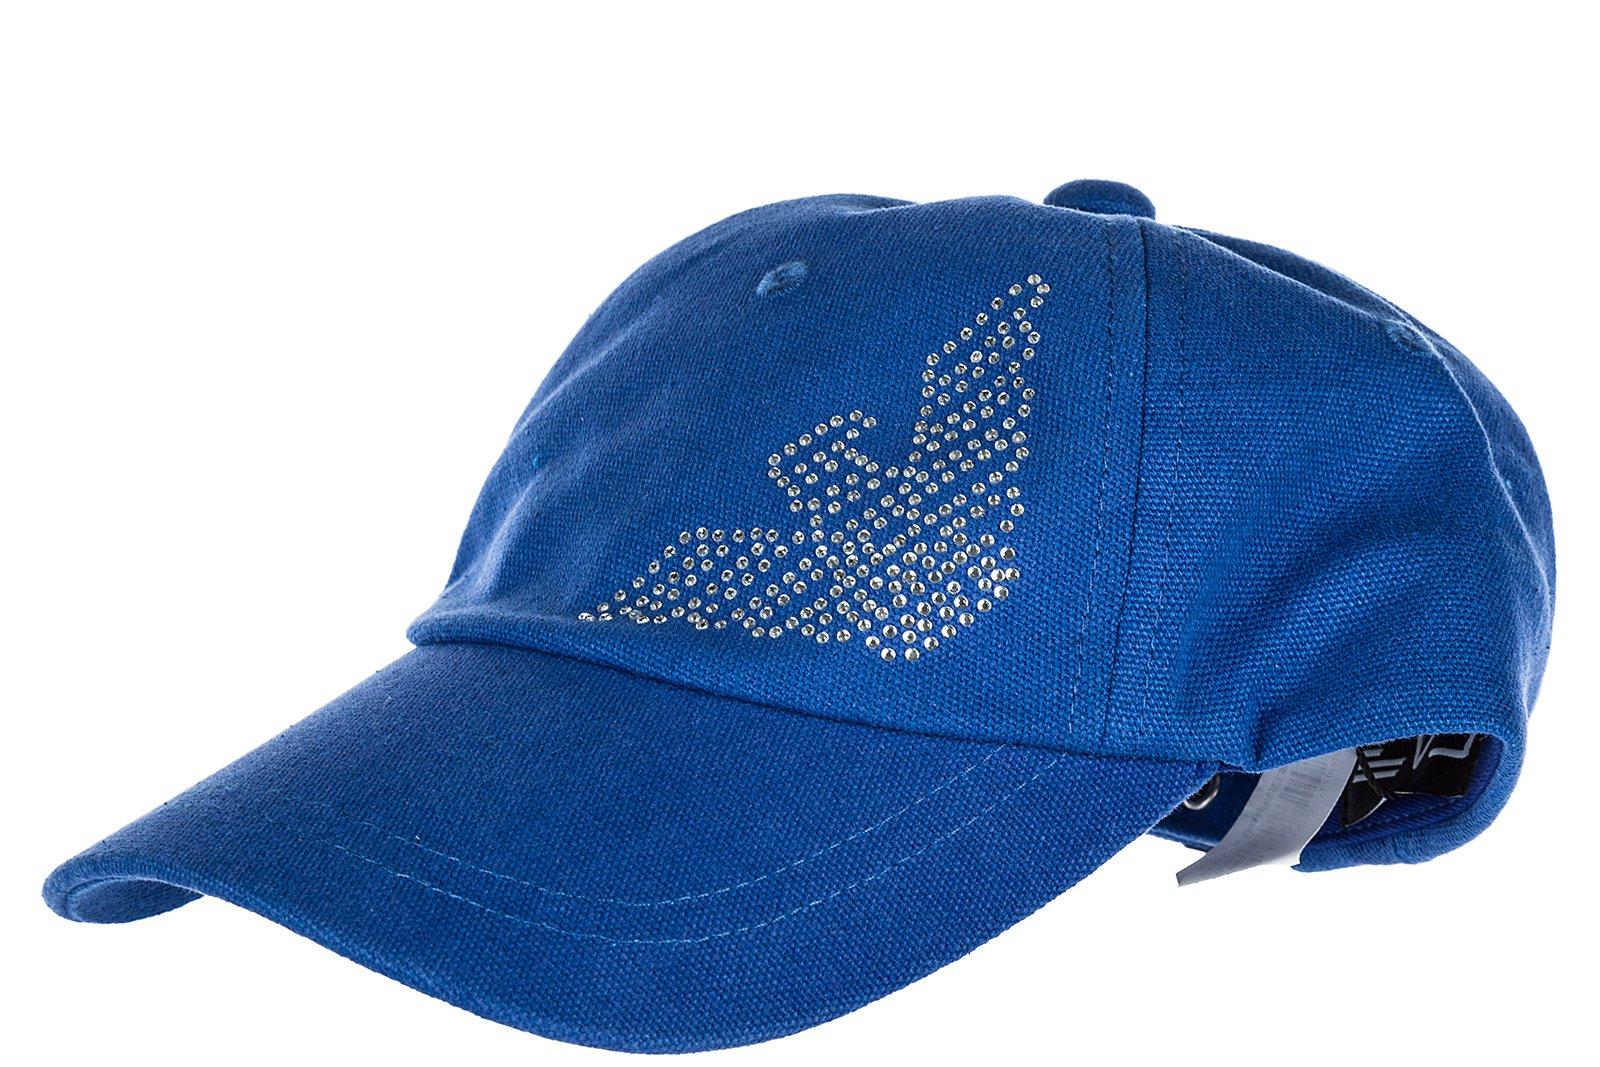 Emporio Armani EA7 adjustable women's hat baseball cap train evolution blu US size UNI 2855598P51310433